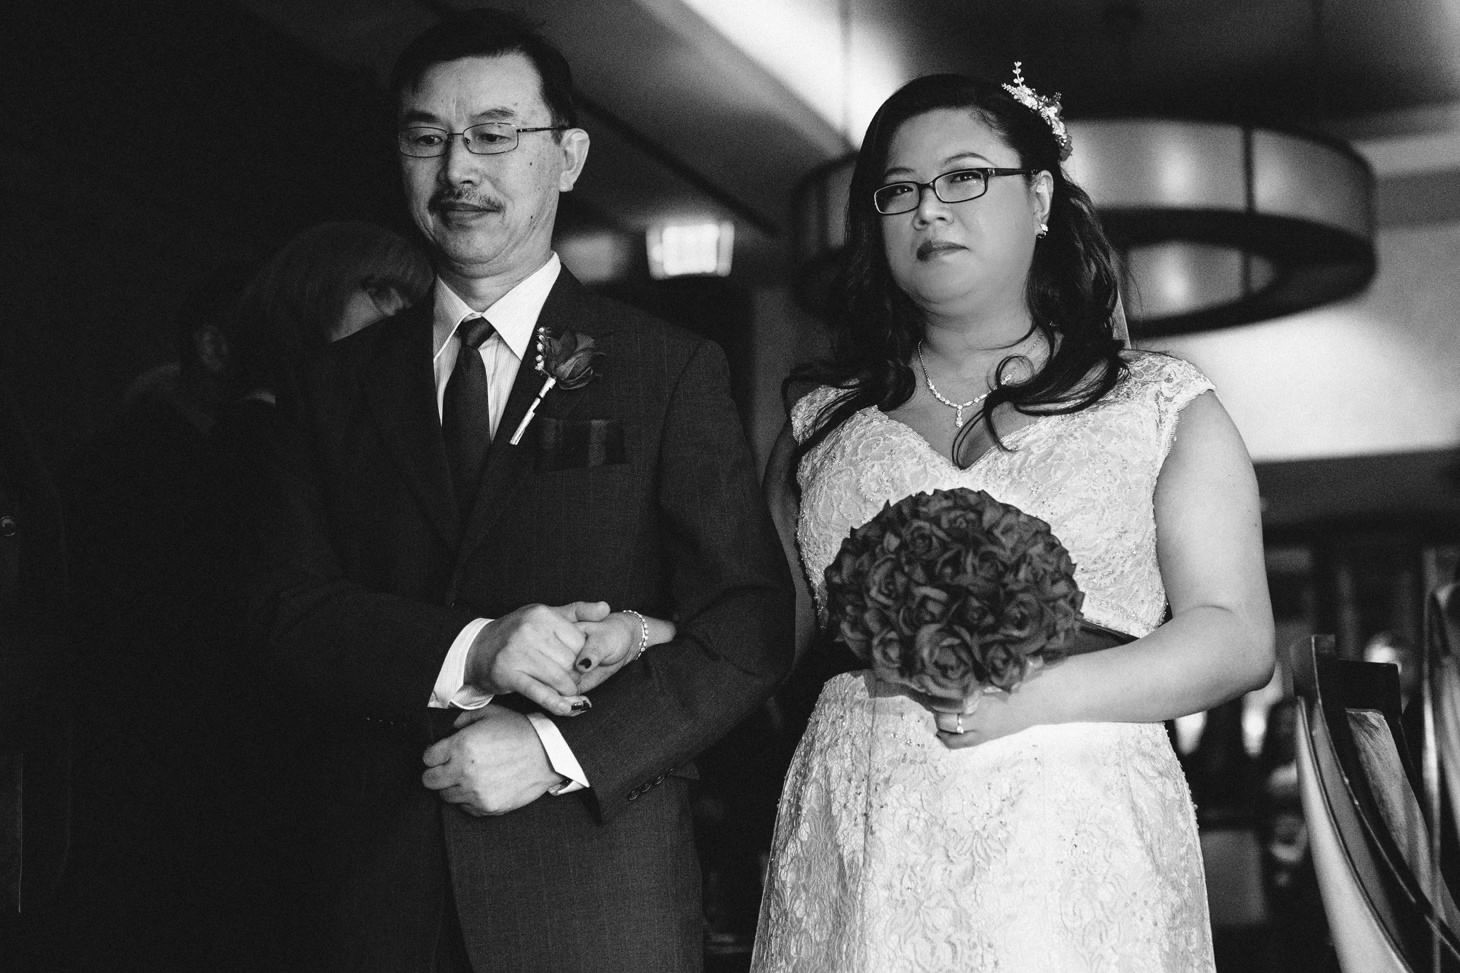 032-nyc-wedding-portrait-photographer-times-square-muse-hotel-winter-wedding-smitten-chickens.jpg